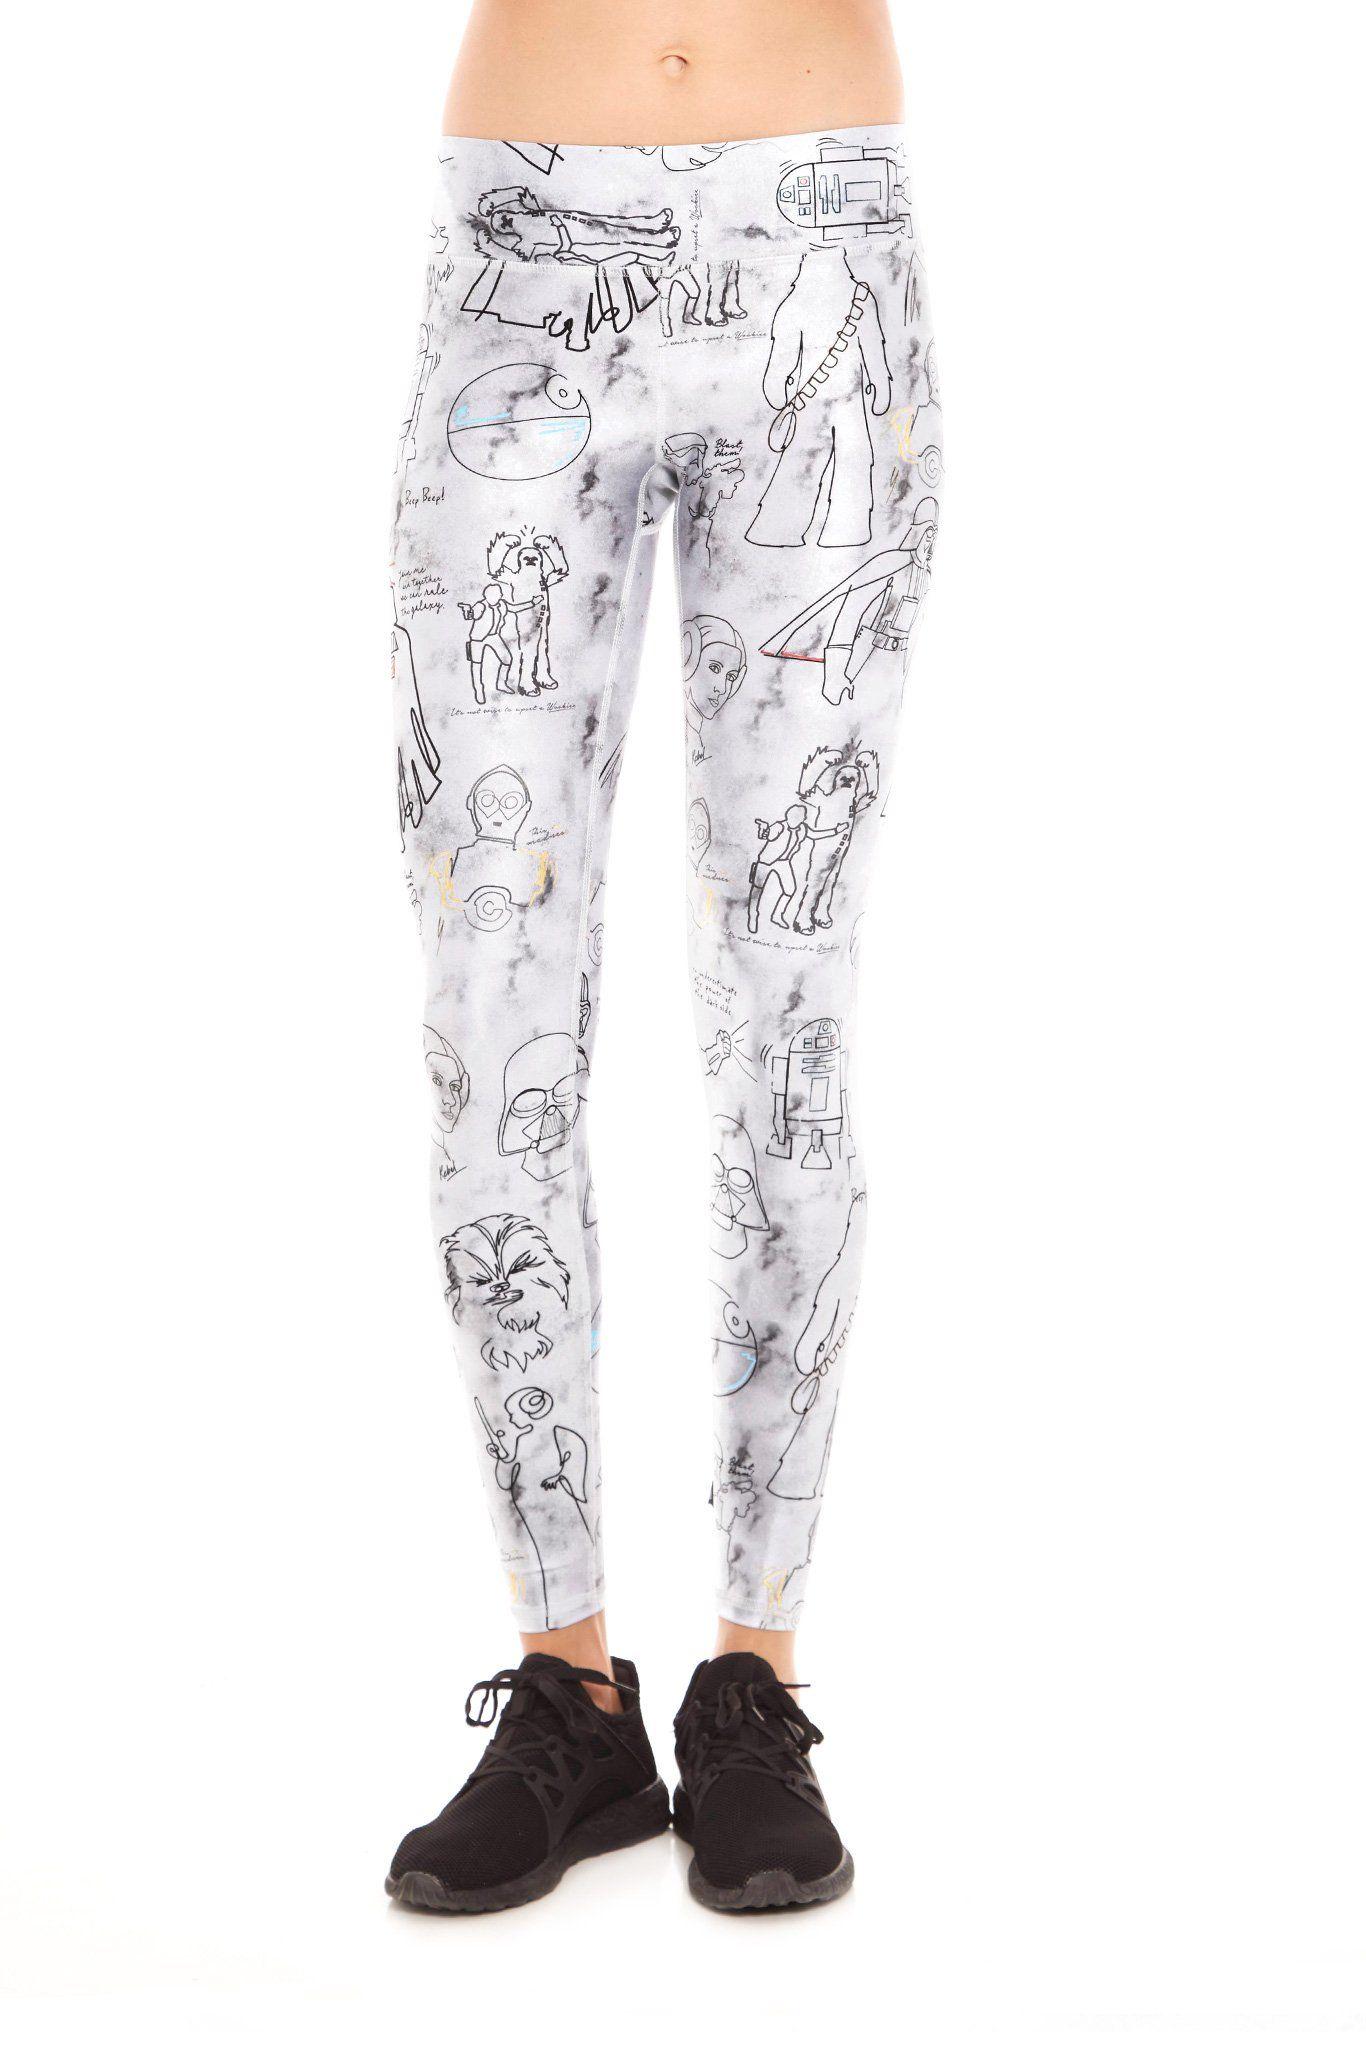 fbb8ac9aac4d9 Women's Terez x Star Wars Sketch Tall Band Leggings ⭐️The Kessel Runway ⭐ Star  Wars fashion ⭐ Geek Fashion ⭐ Star Wars Style ⭐ Geek Chic ⭐️